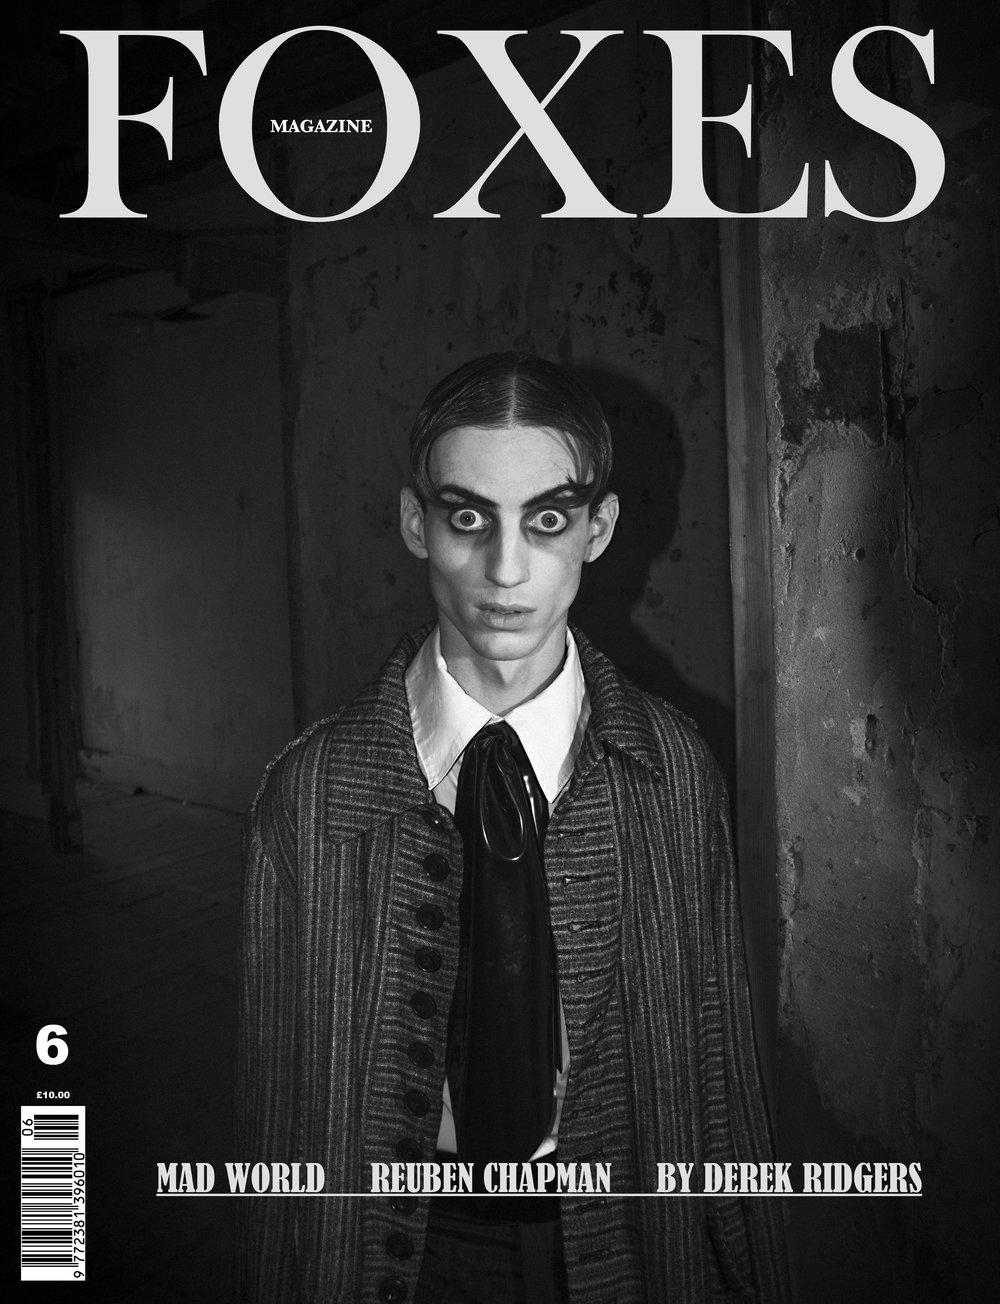 FOXES_MAGAZINE_602_REUBEN.jpg